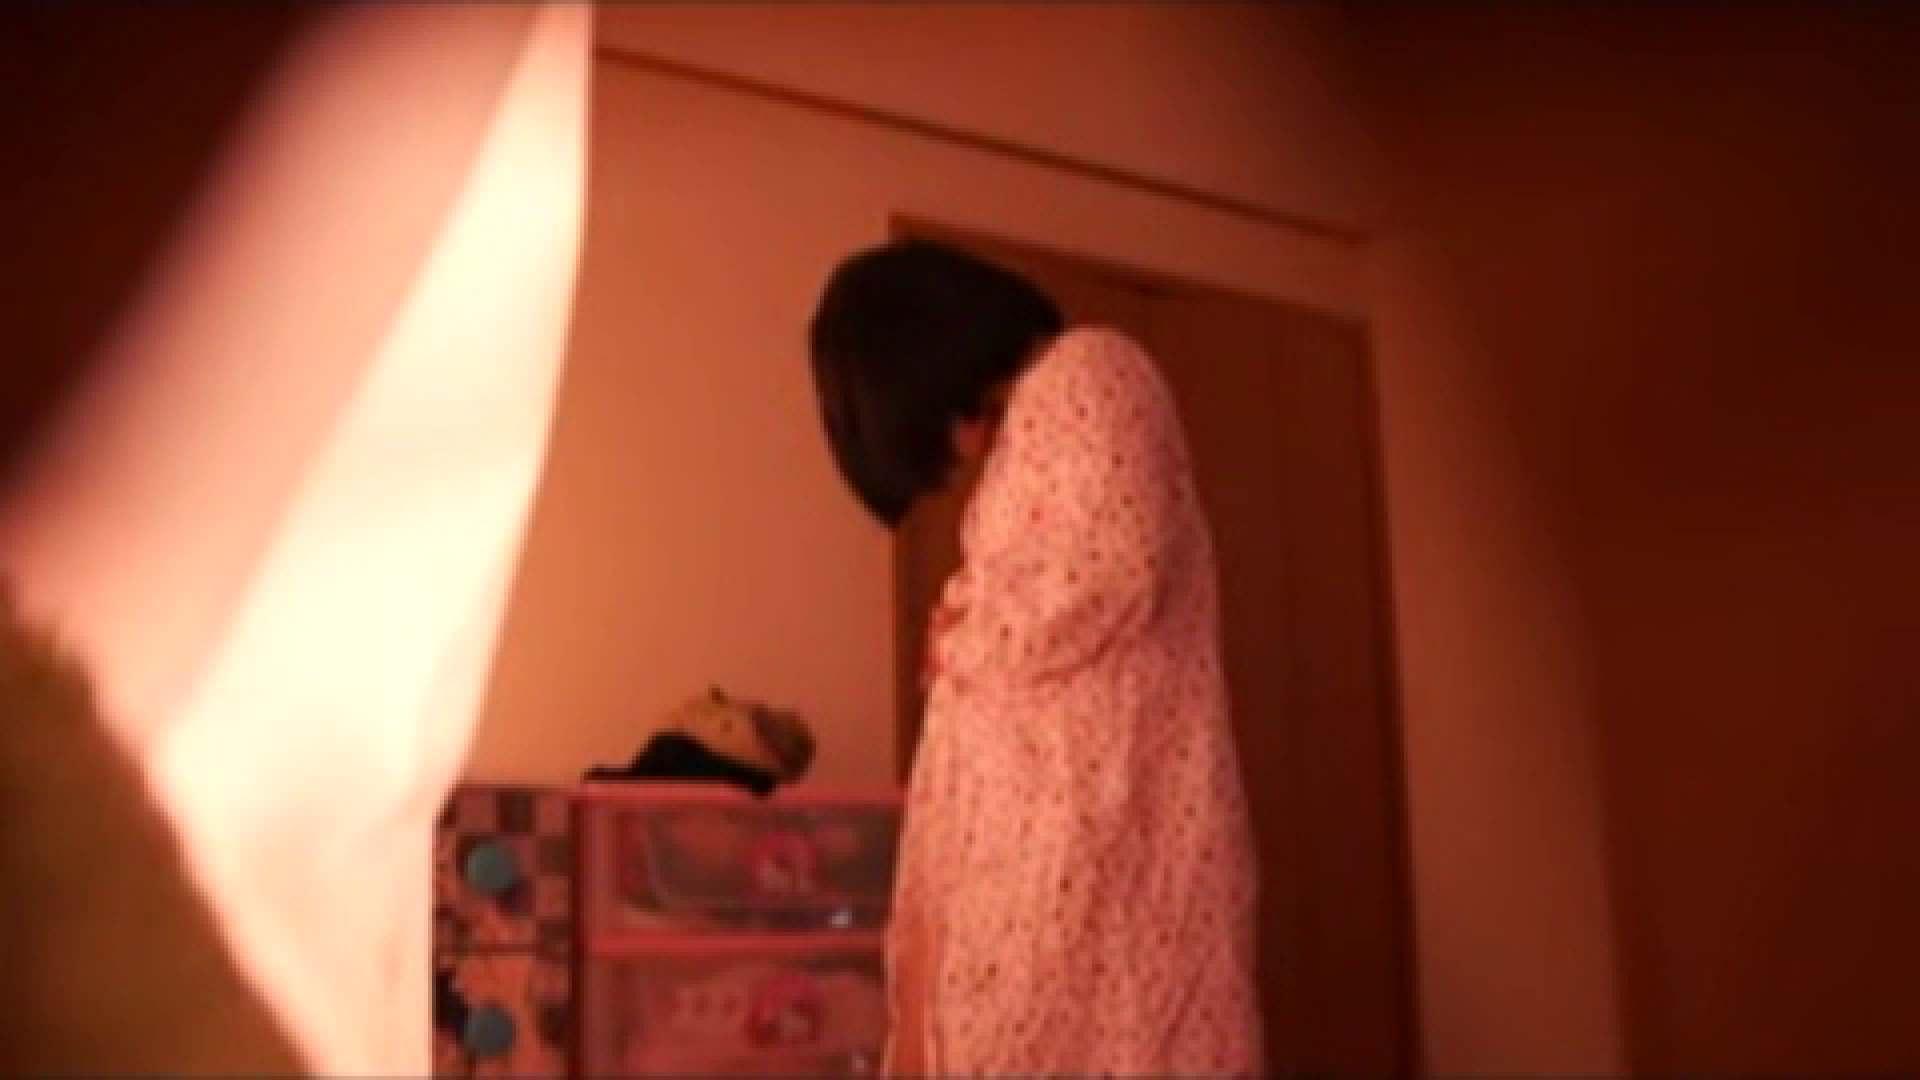 vol.2 まりこさんのお着替え、就寝前の映像です。 アラ30 戯れ無修正画像 71画像 63